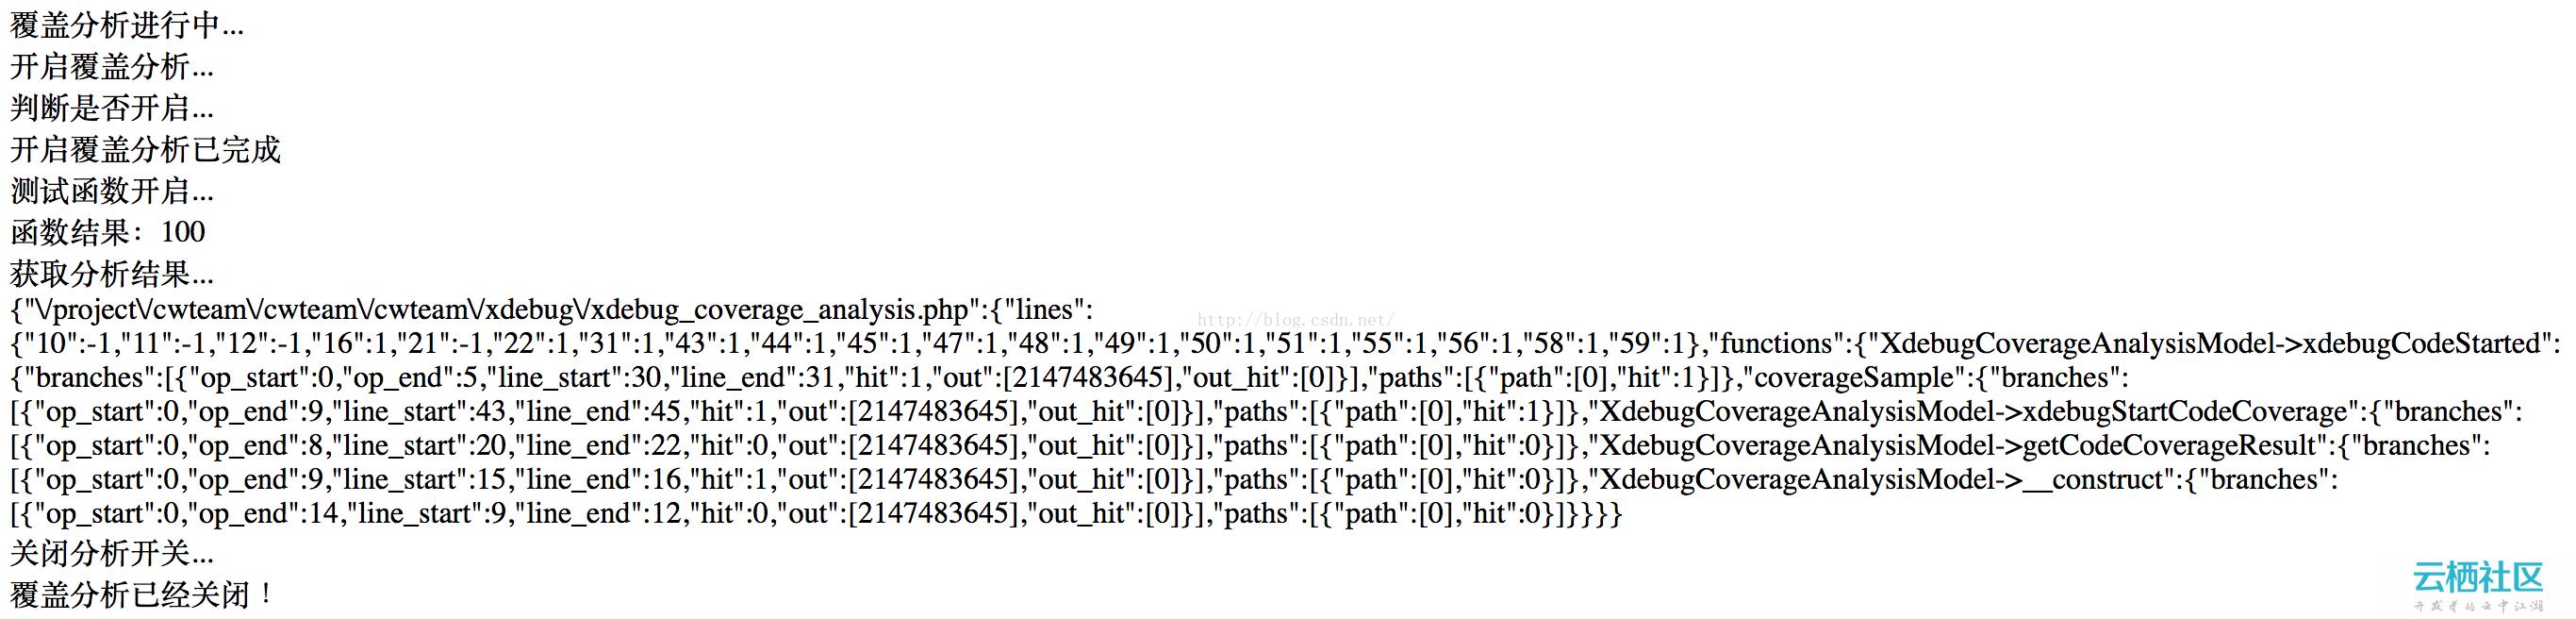 PHP调试跟踪之XDebug使用总结-